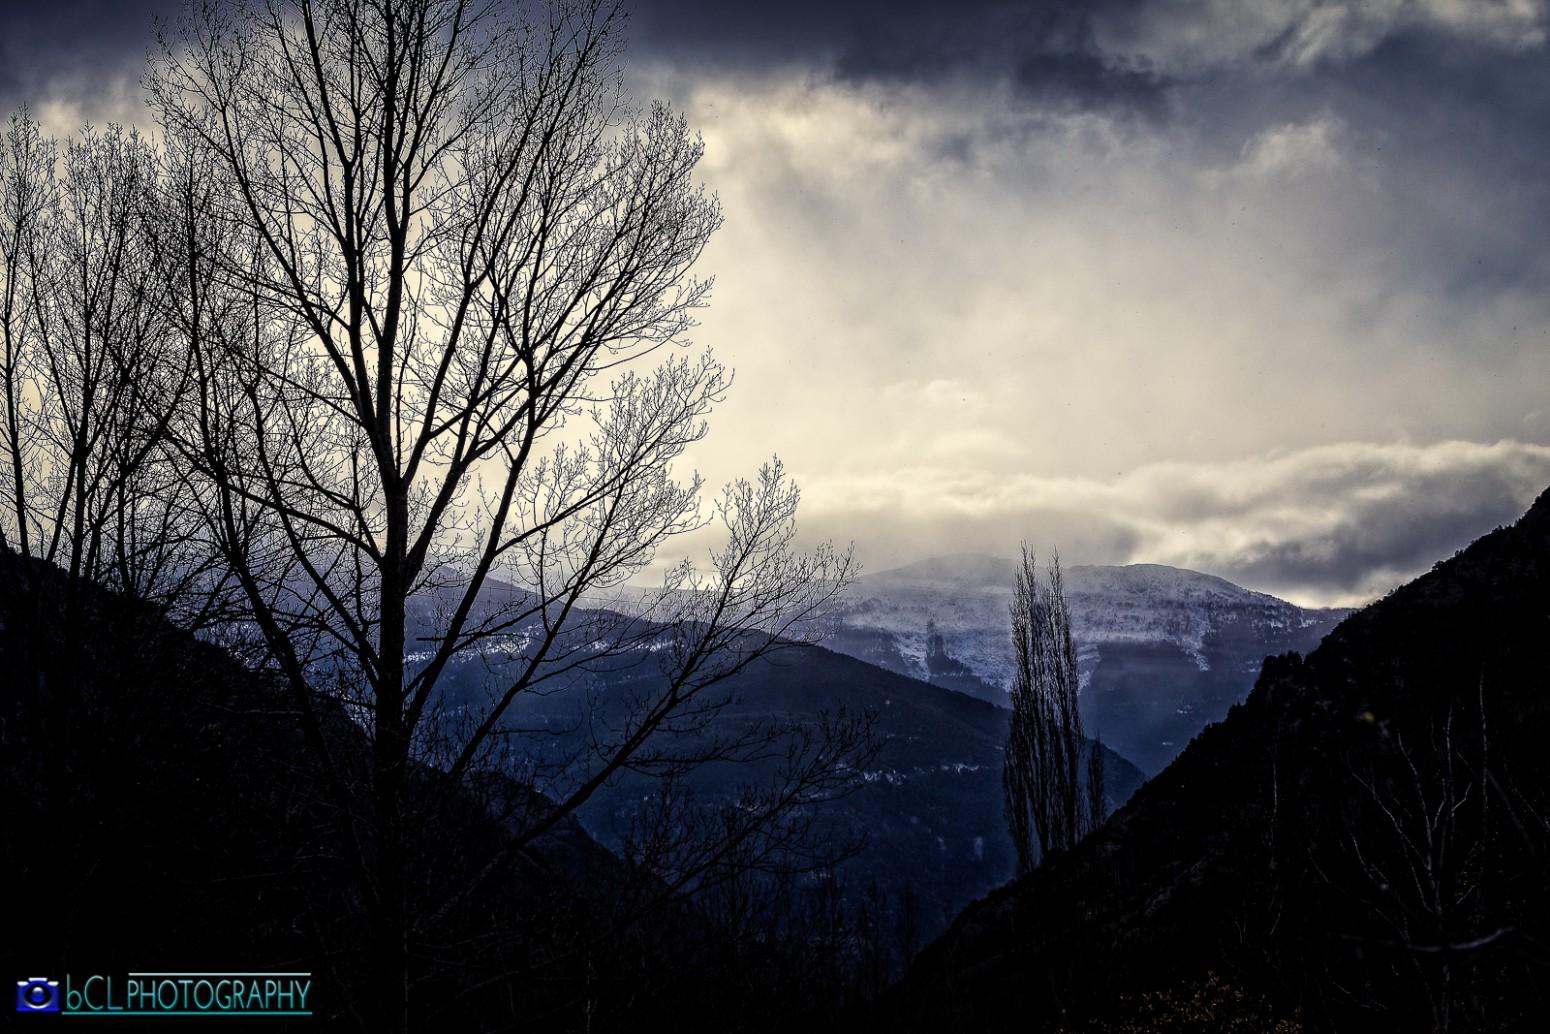 Dark landscape | bCL Photography